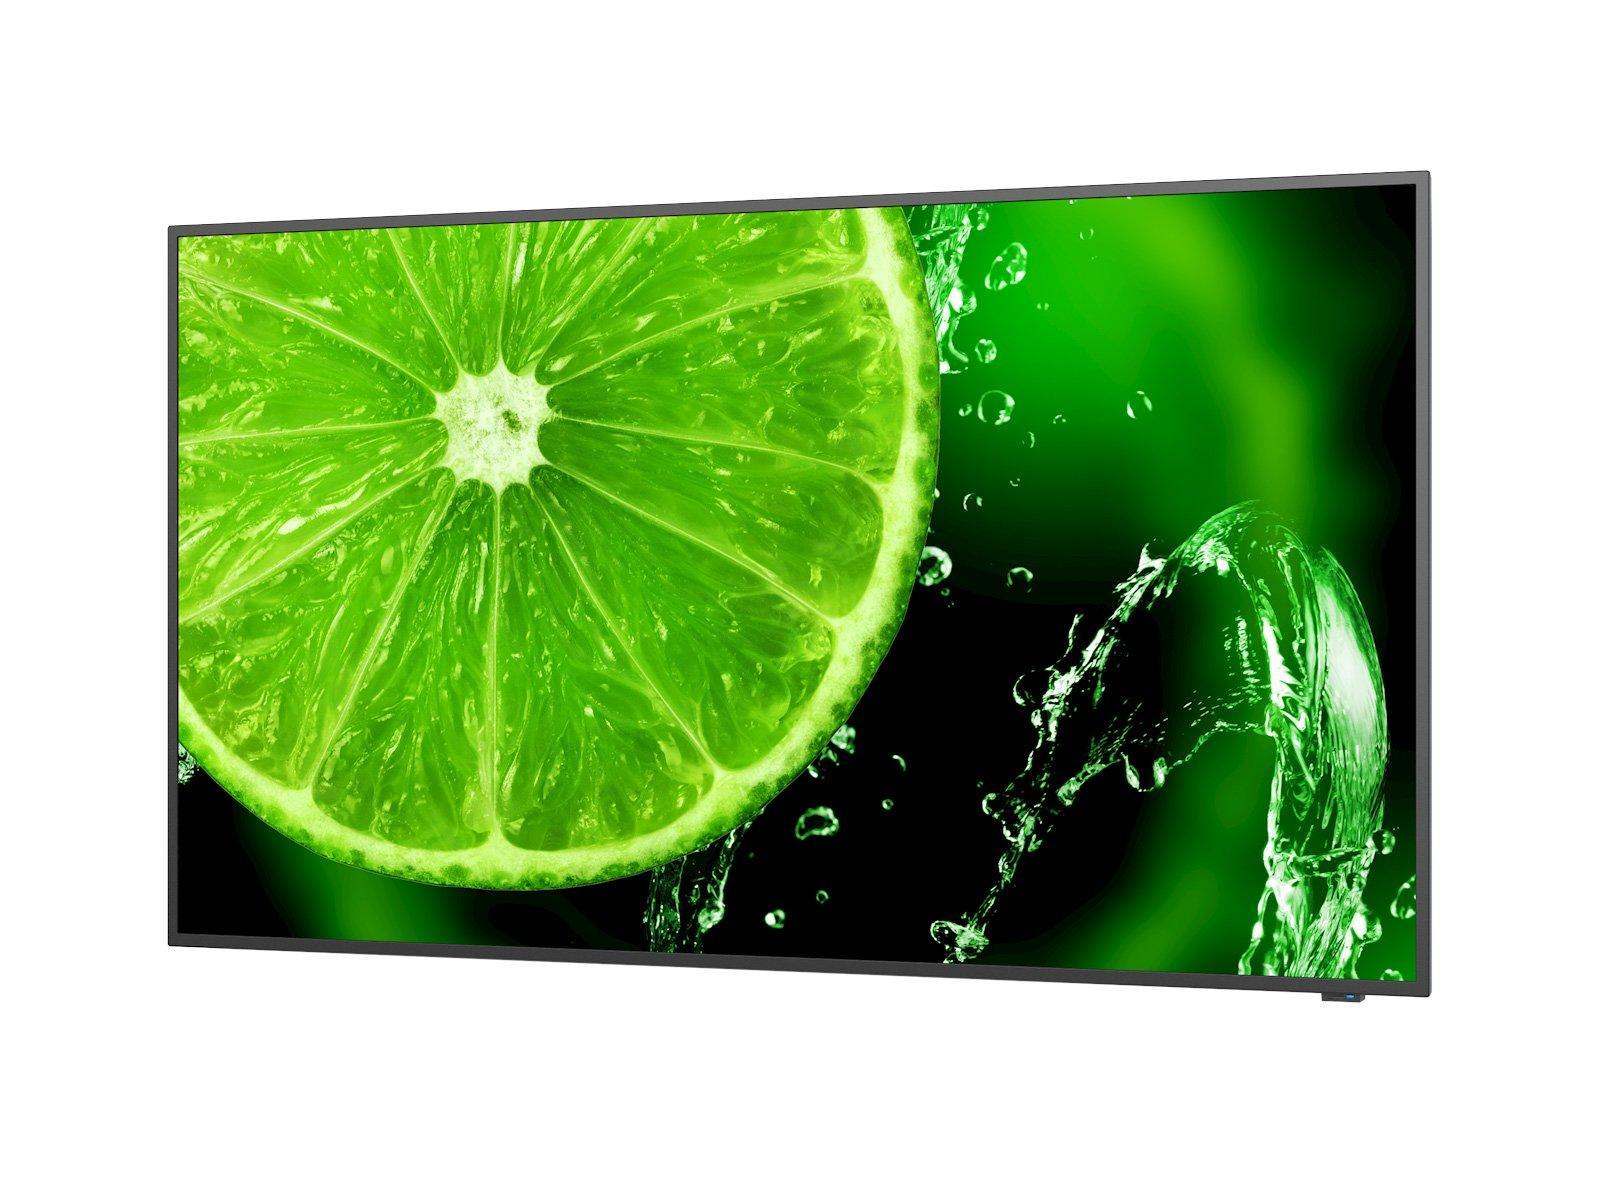 "Широкоформатен дисплей NEC MultiSync E438, 43"", UHD, 350cd/m2, Direct LED backlight, 16/7 proof, Media Player-2"